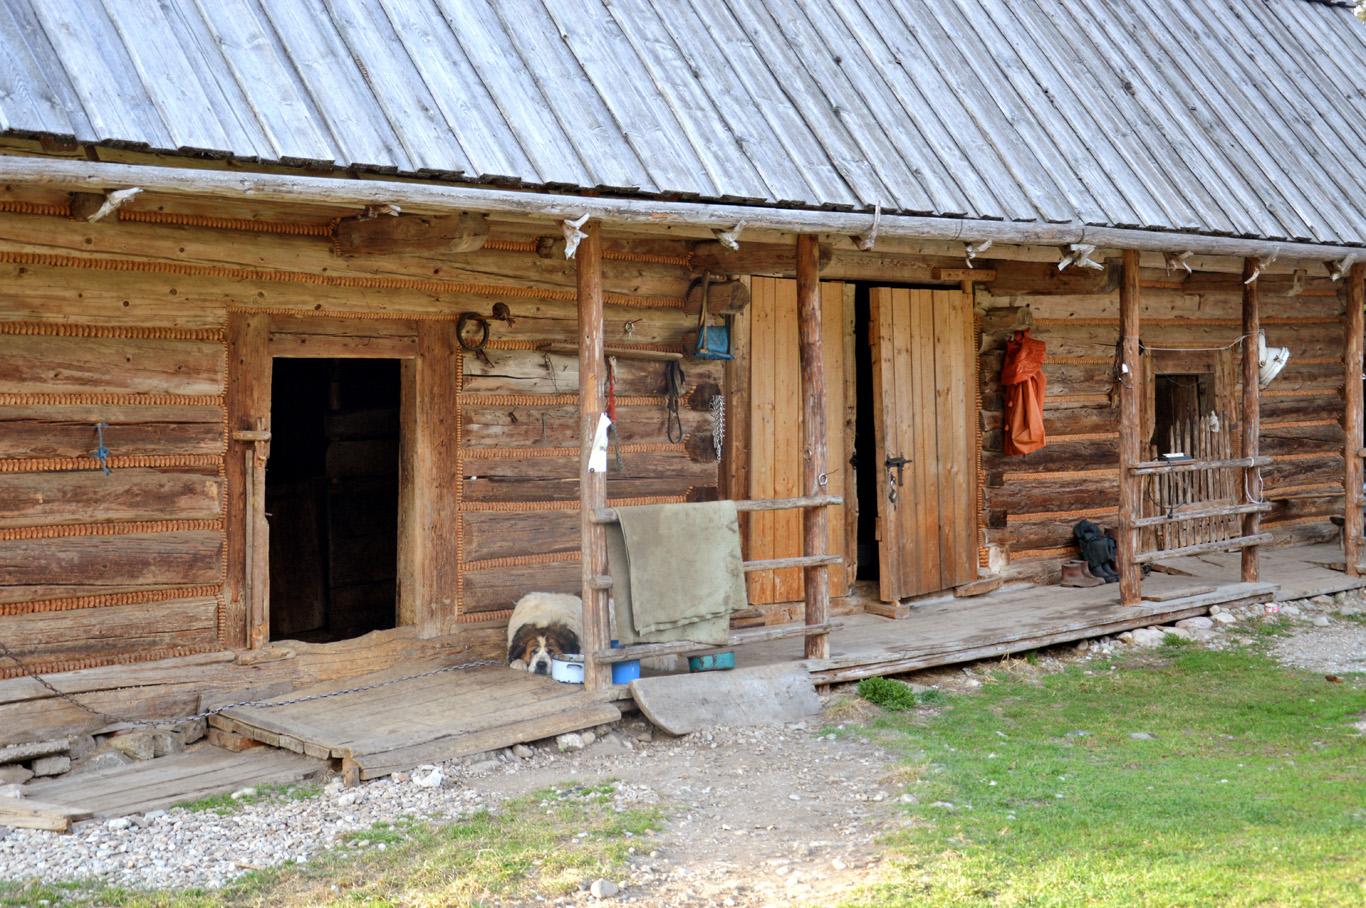 Typical wooden hut in Zakopane